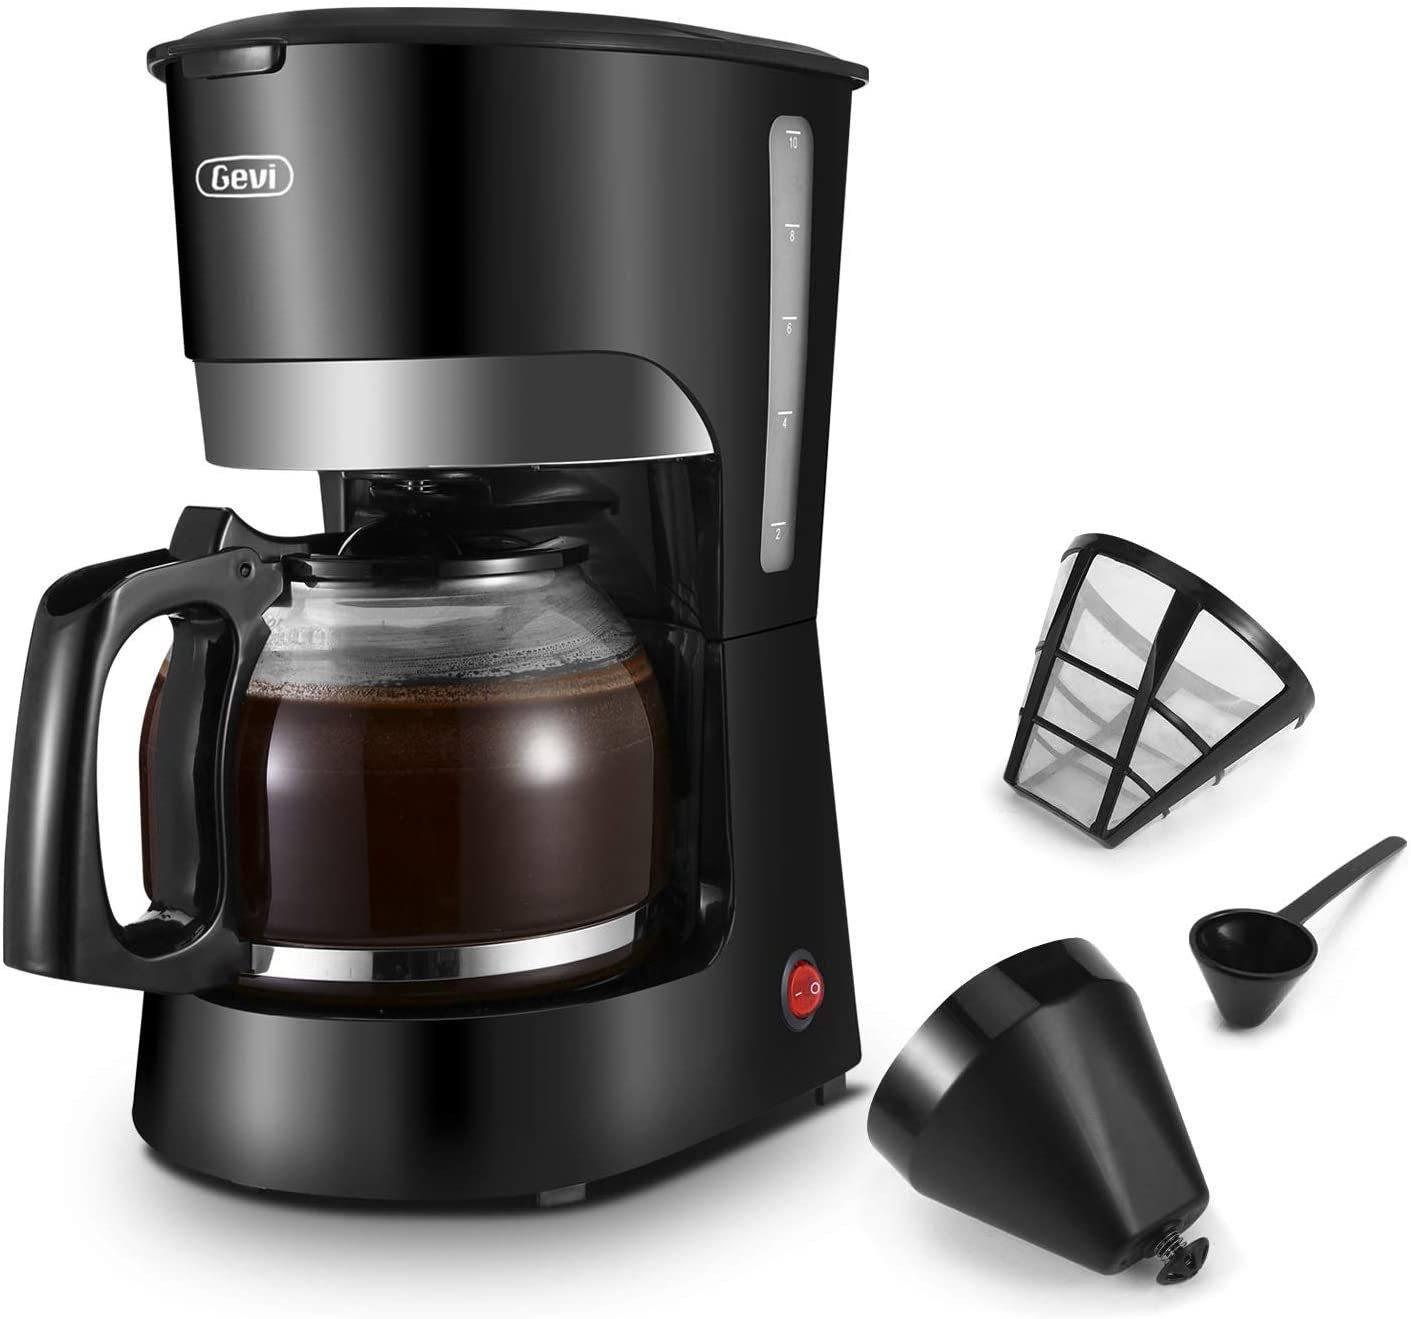 Gevi 10-Cup Coffee Maker